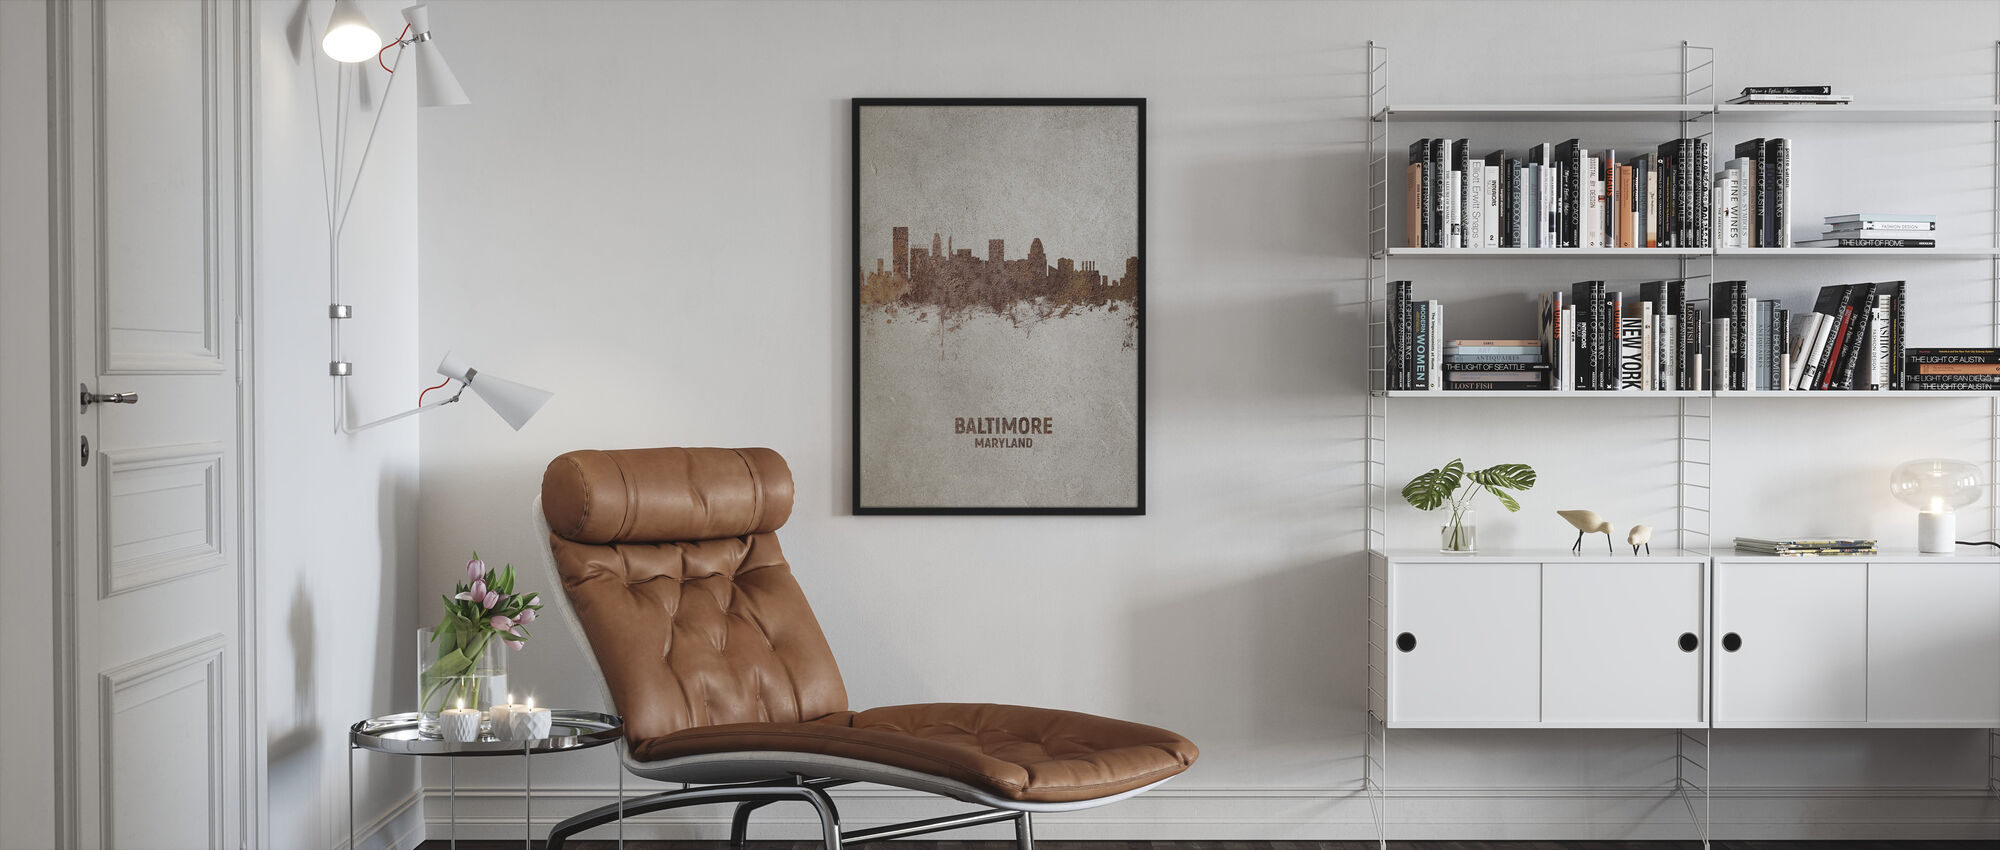 Baltimore Maryland Rust Skyline - Innrammet bilde - Stue